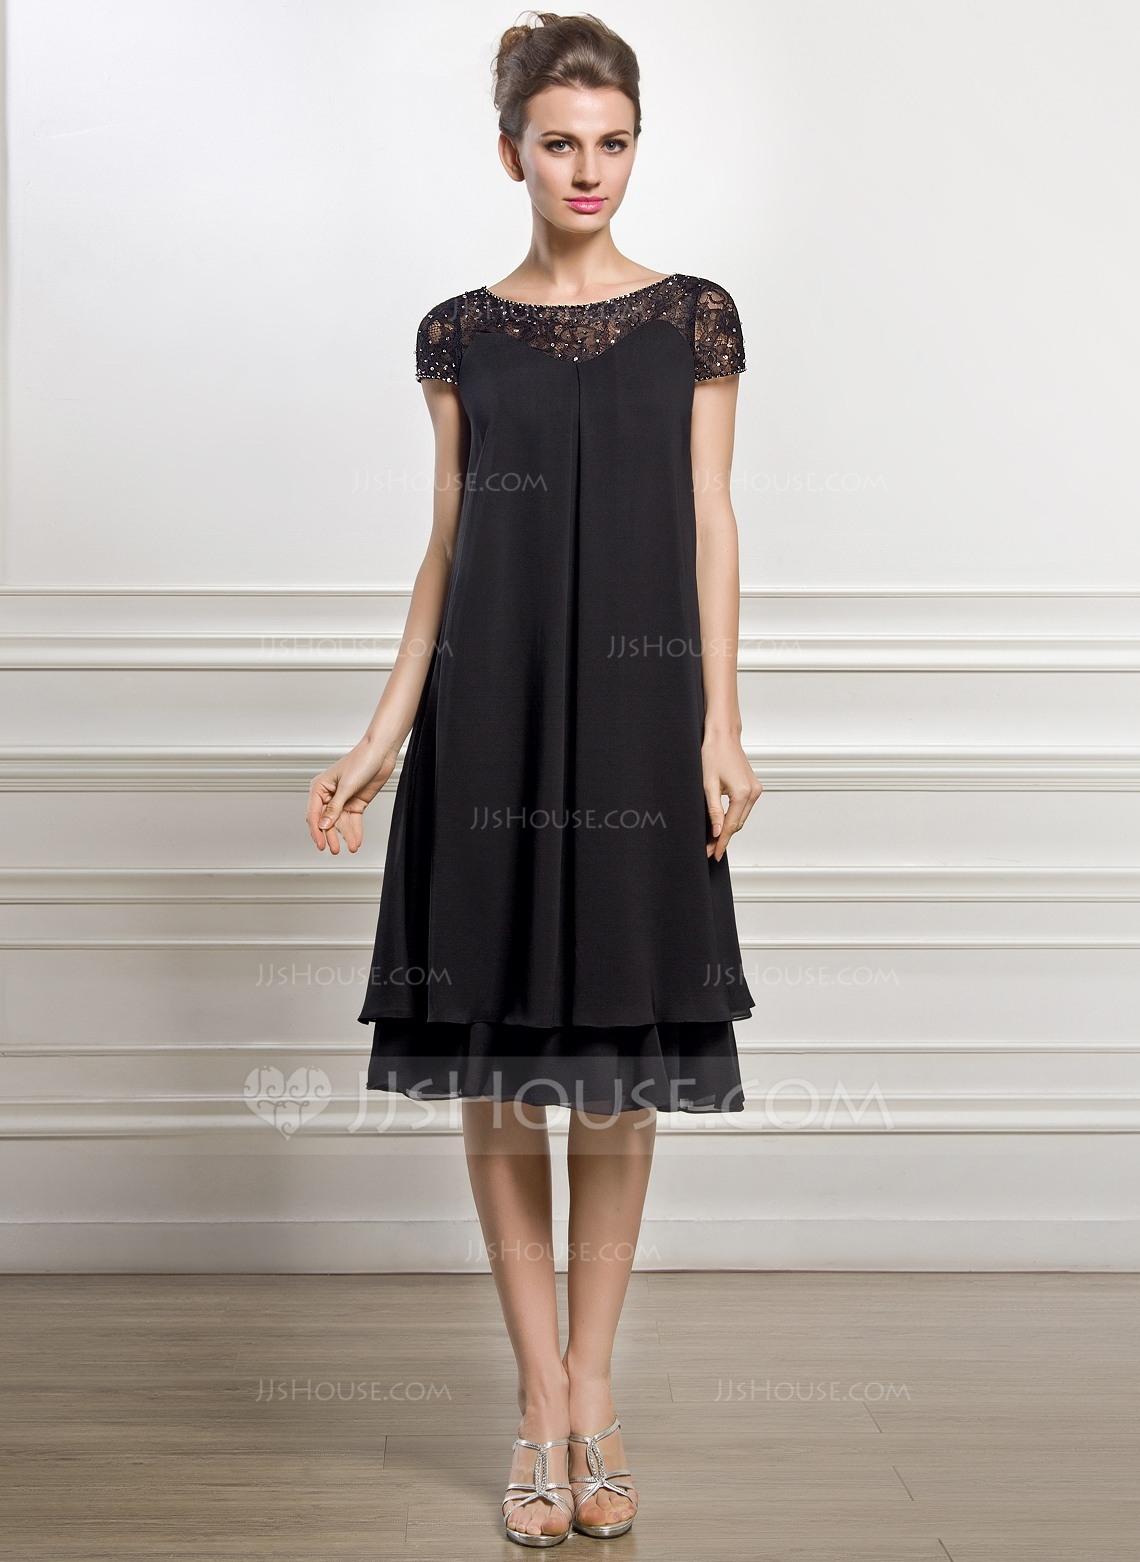 17 Cool Kleider Für Brautmutter Knielang Bester PreisAbend Spektakulär Kleider Für Brautmutter Knielang Galerie